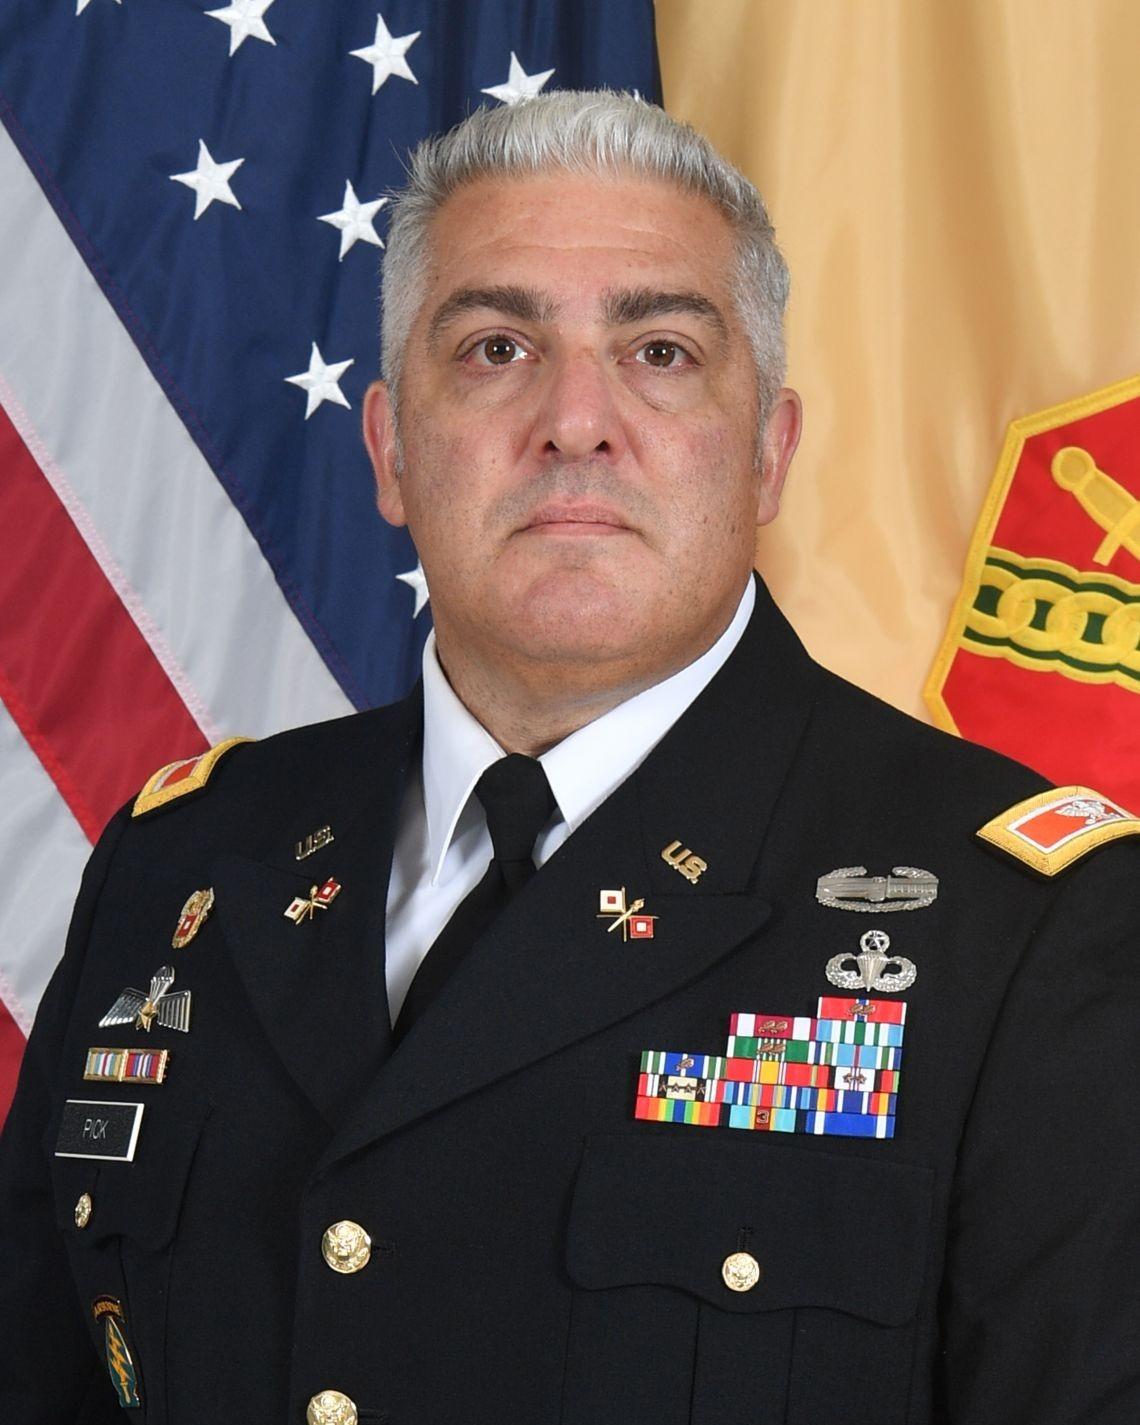 Col. Shaw S. Pick